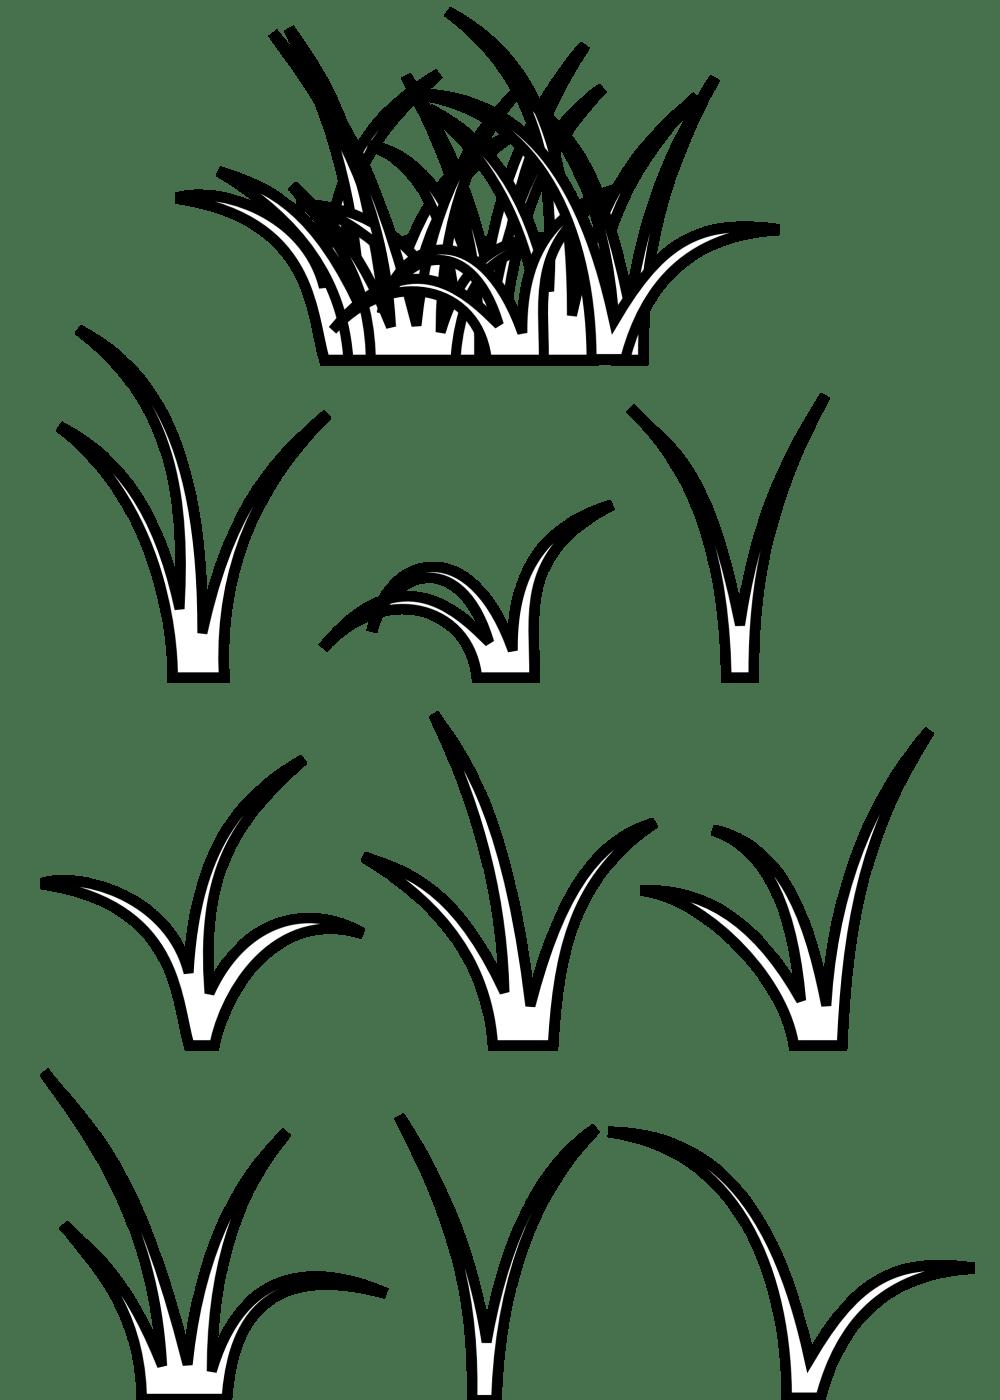 medium resolution of grass clipart clipart